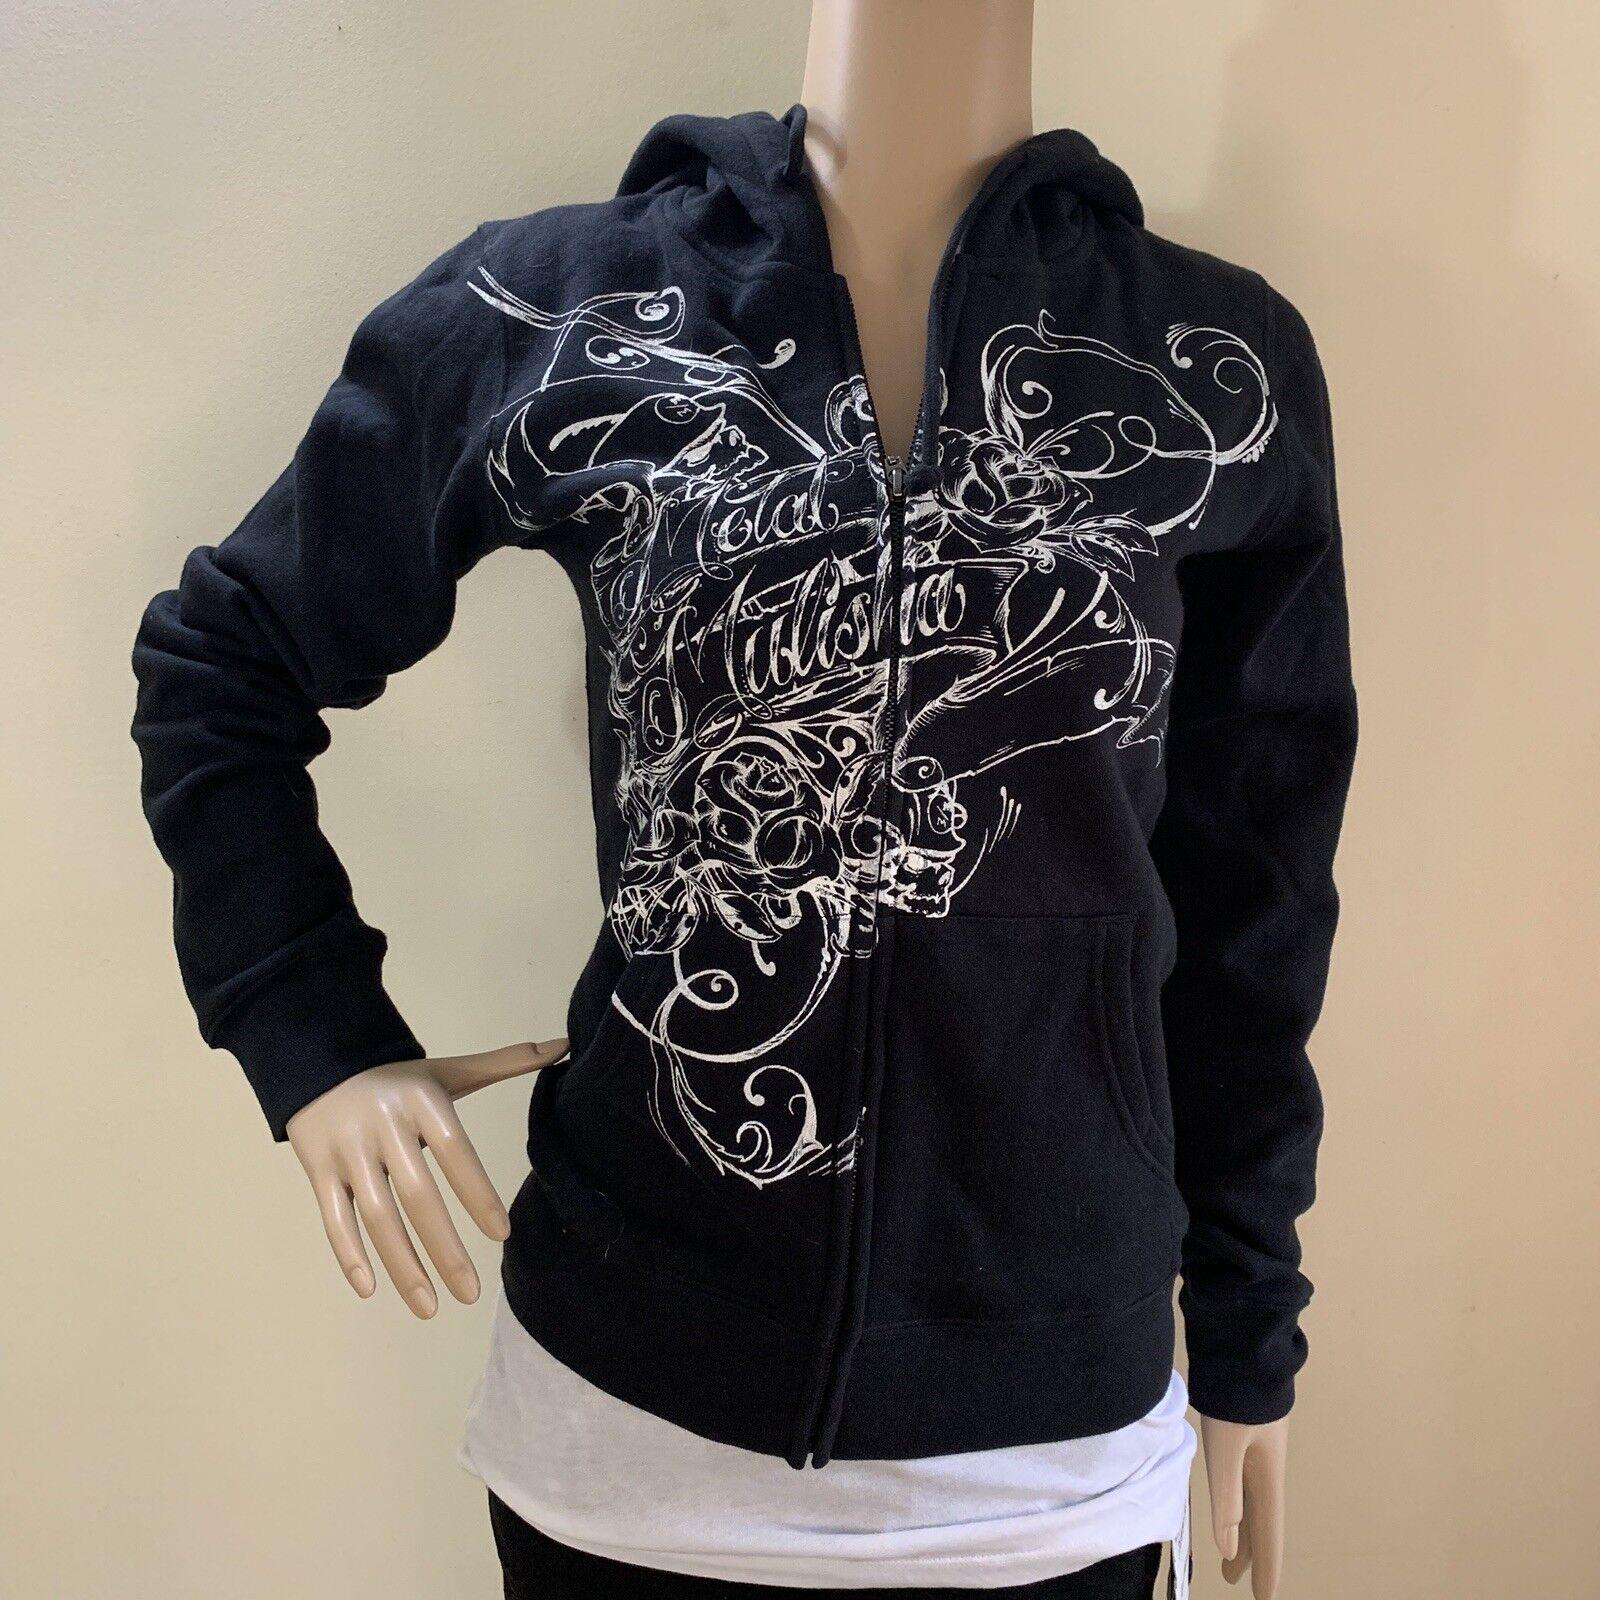 Metal Mulisha Ladies Standard Fleece Zip Hoodie Size S